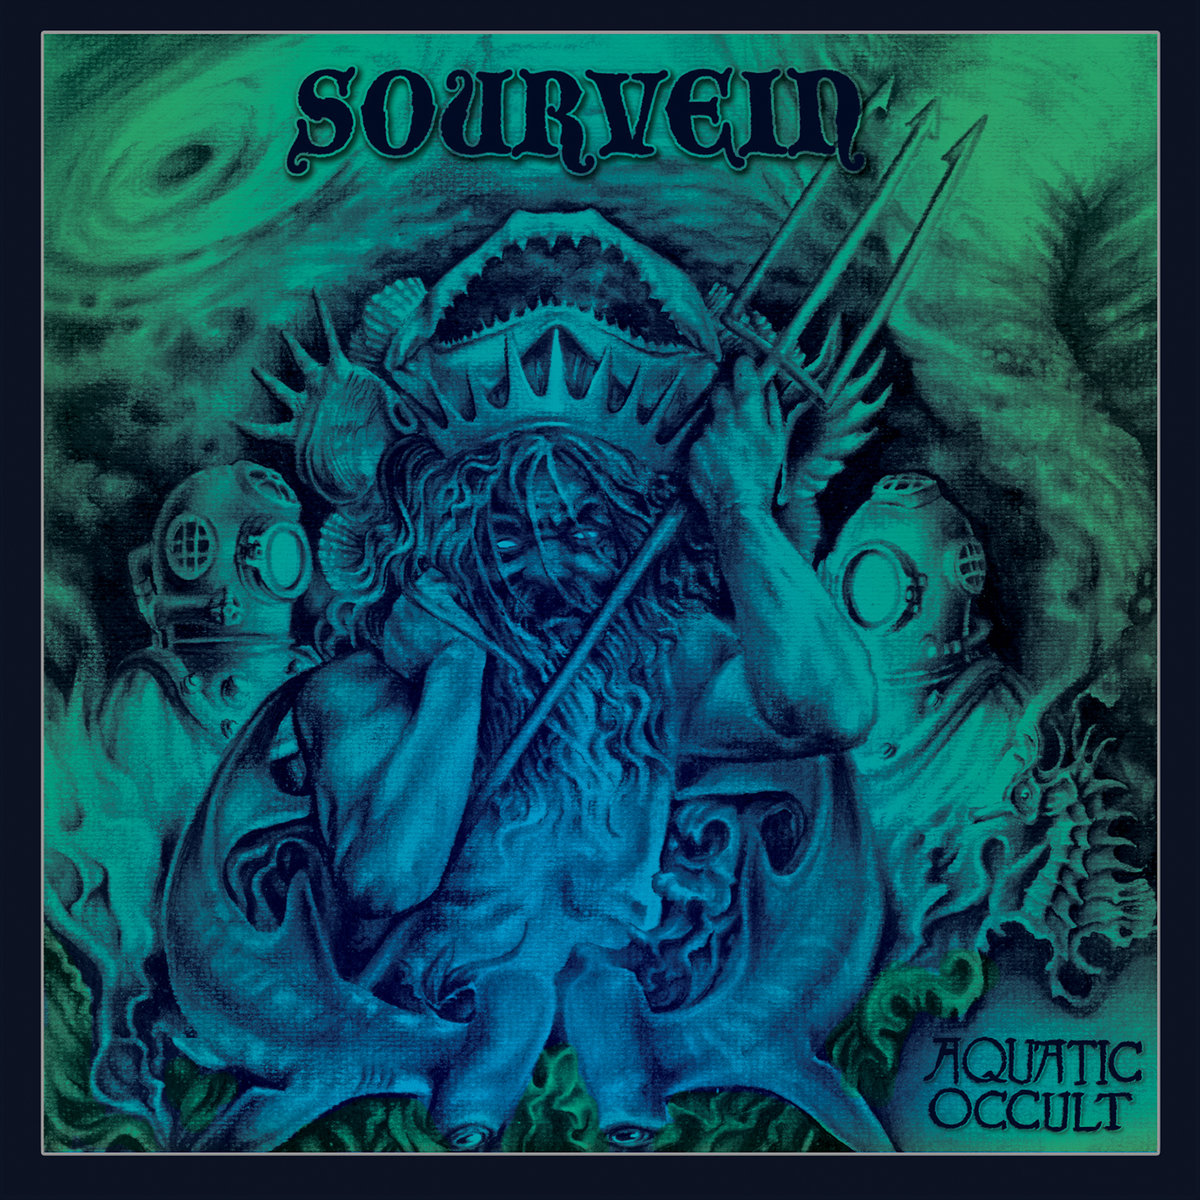 ¿Qué música estás escuchando? - Página 2 Sourvein-Aquatic-Occult